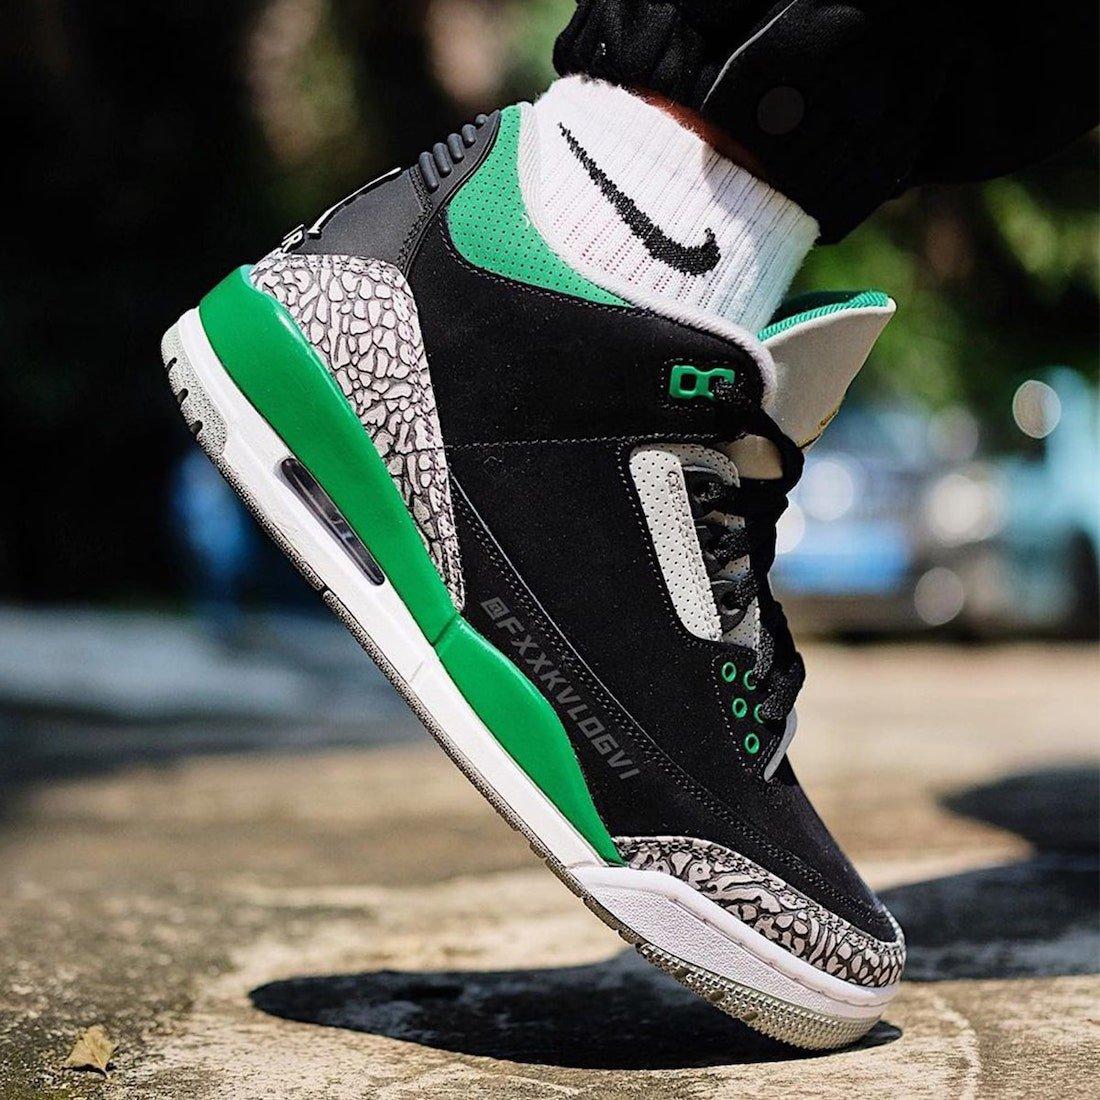 Air Jordan 3 Pine Green CT8532-030 On-Feet